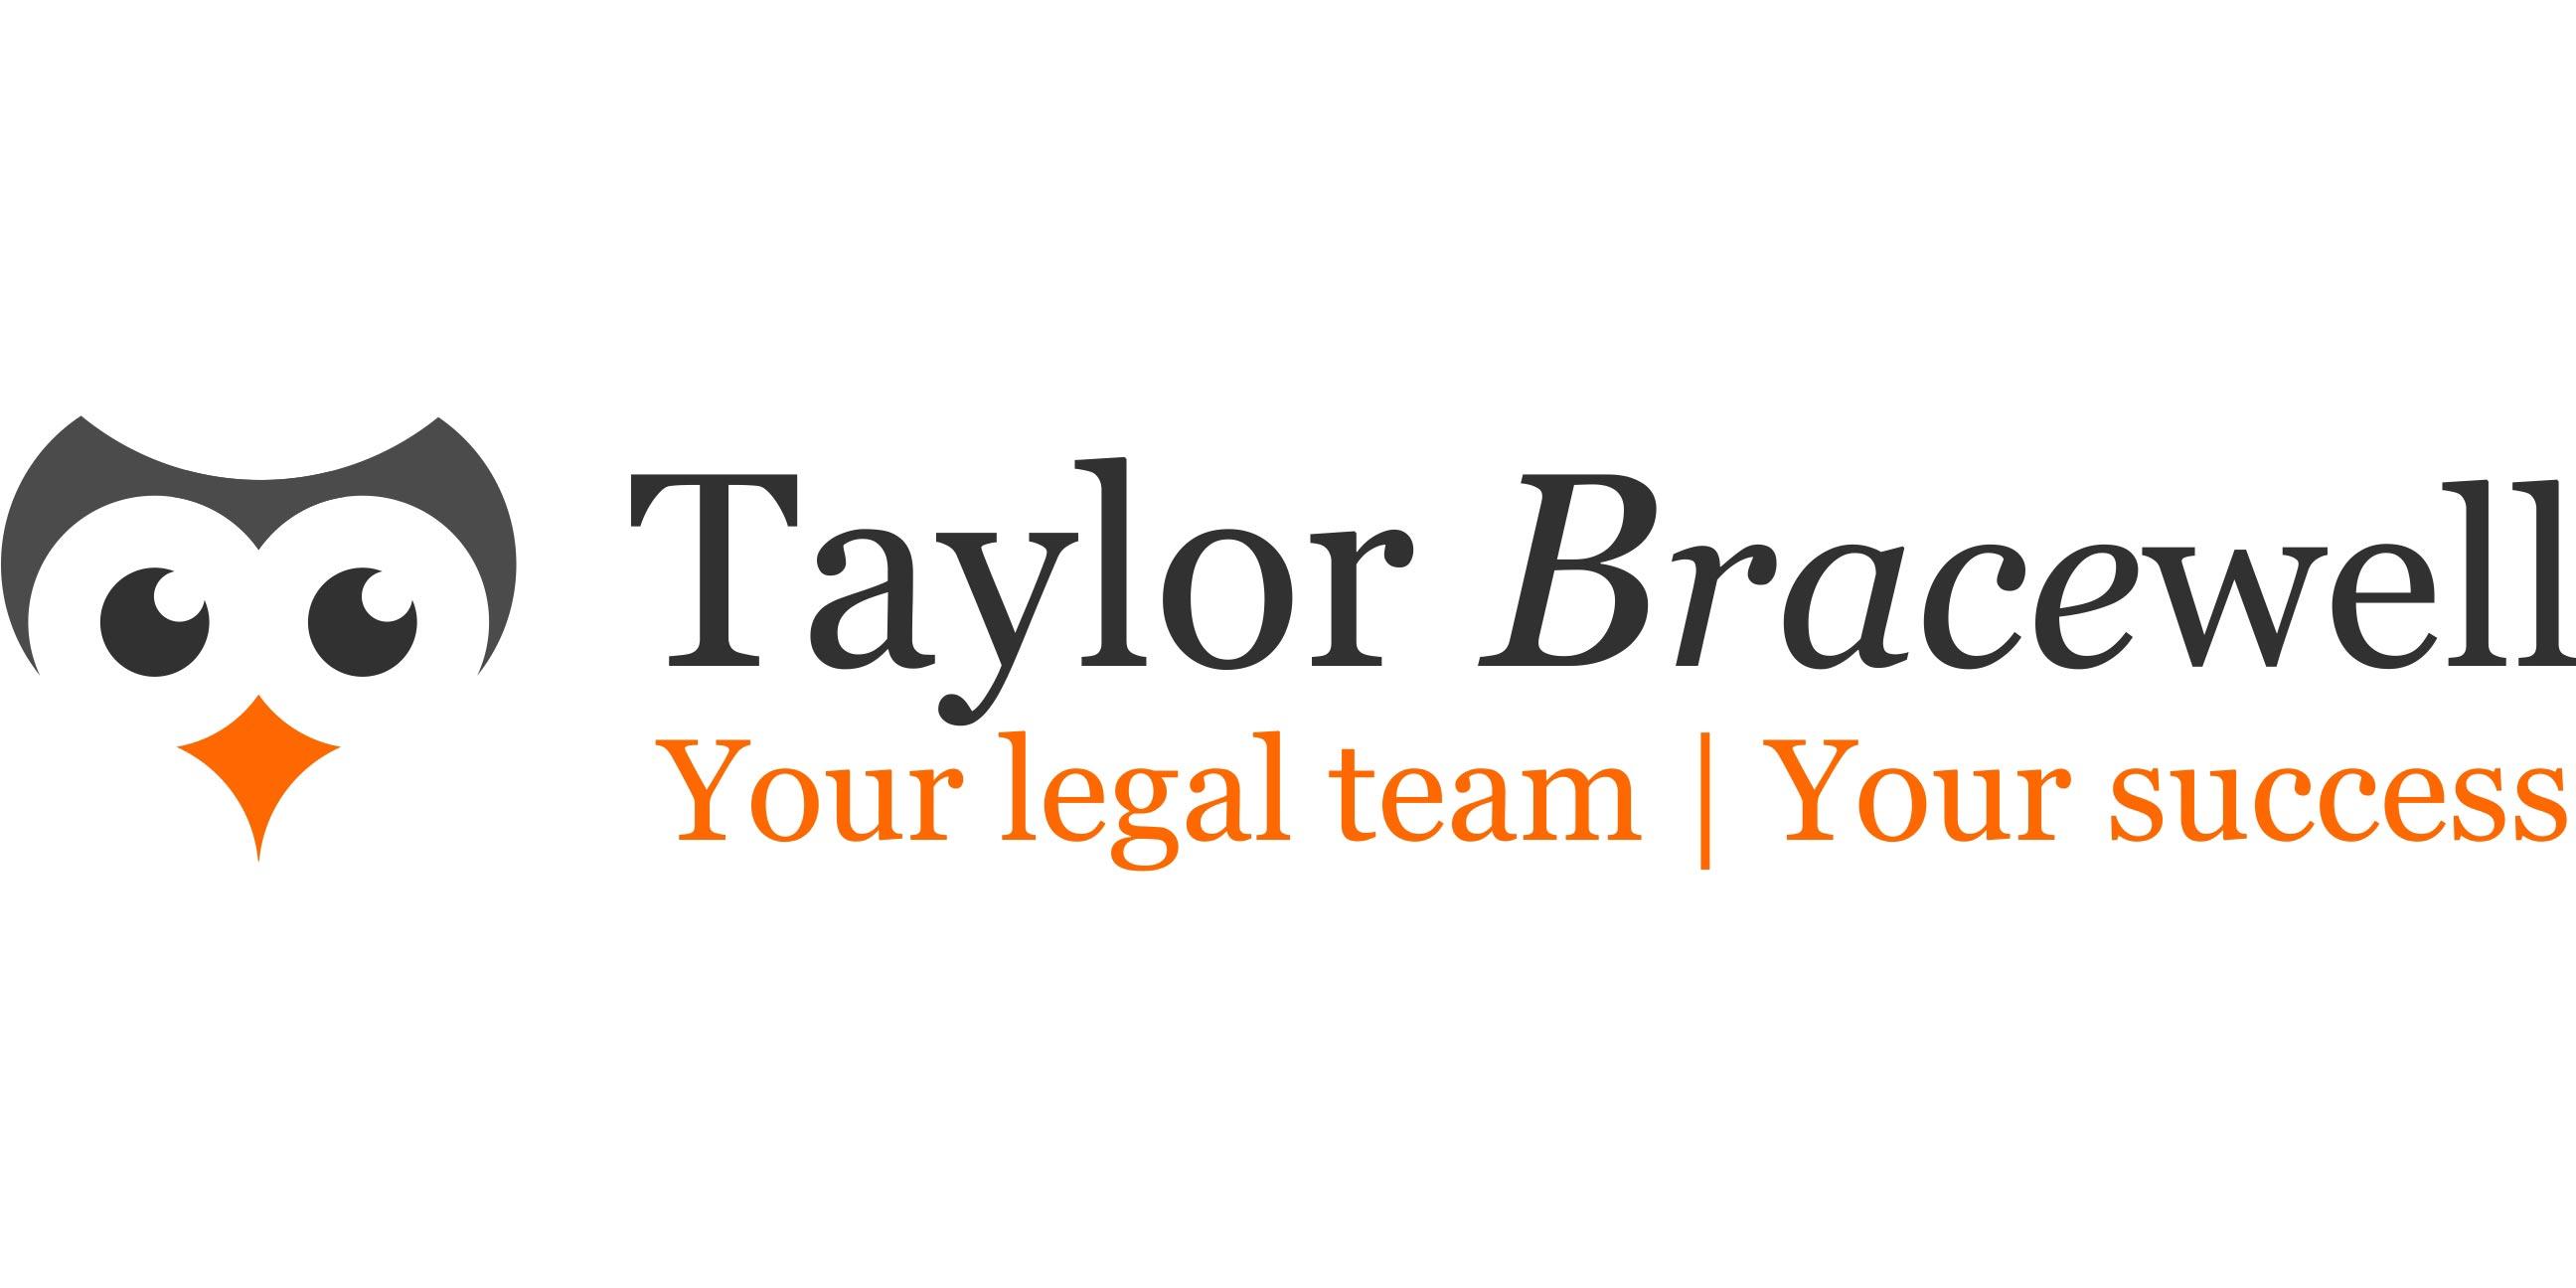 Taylor Bracewell